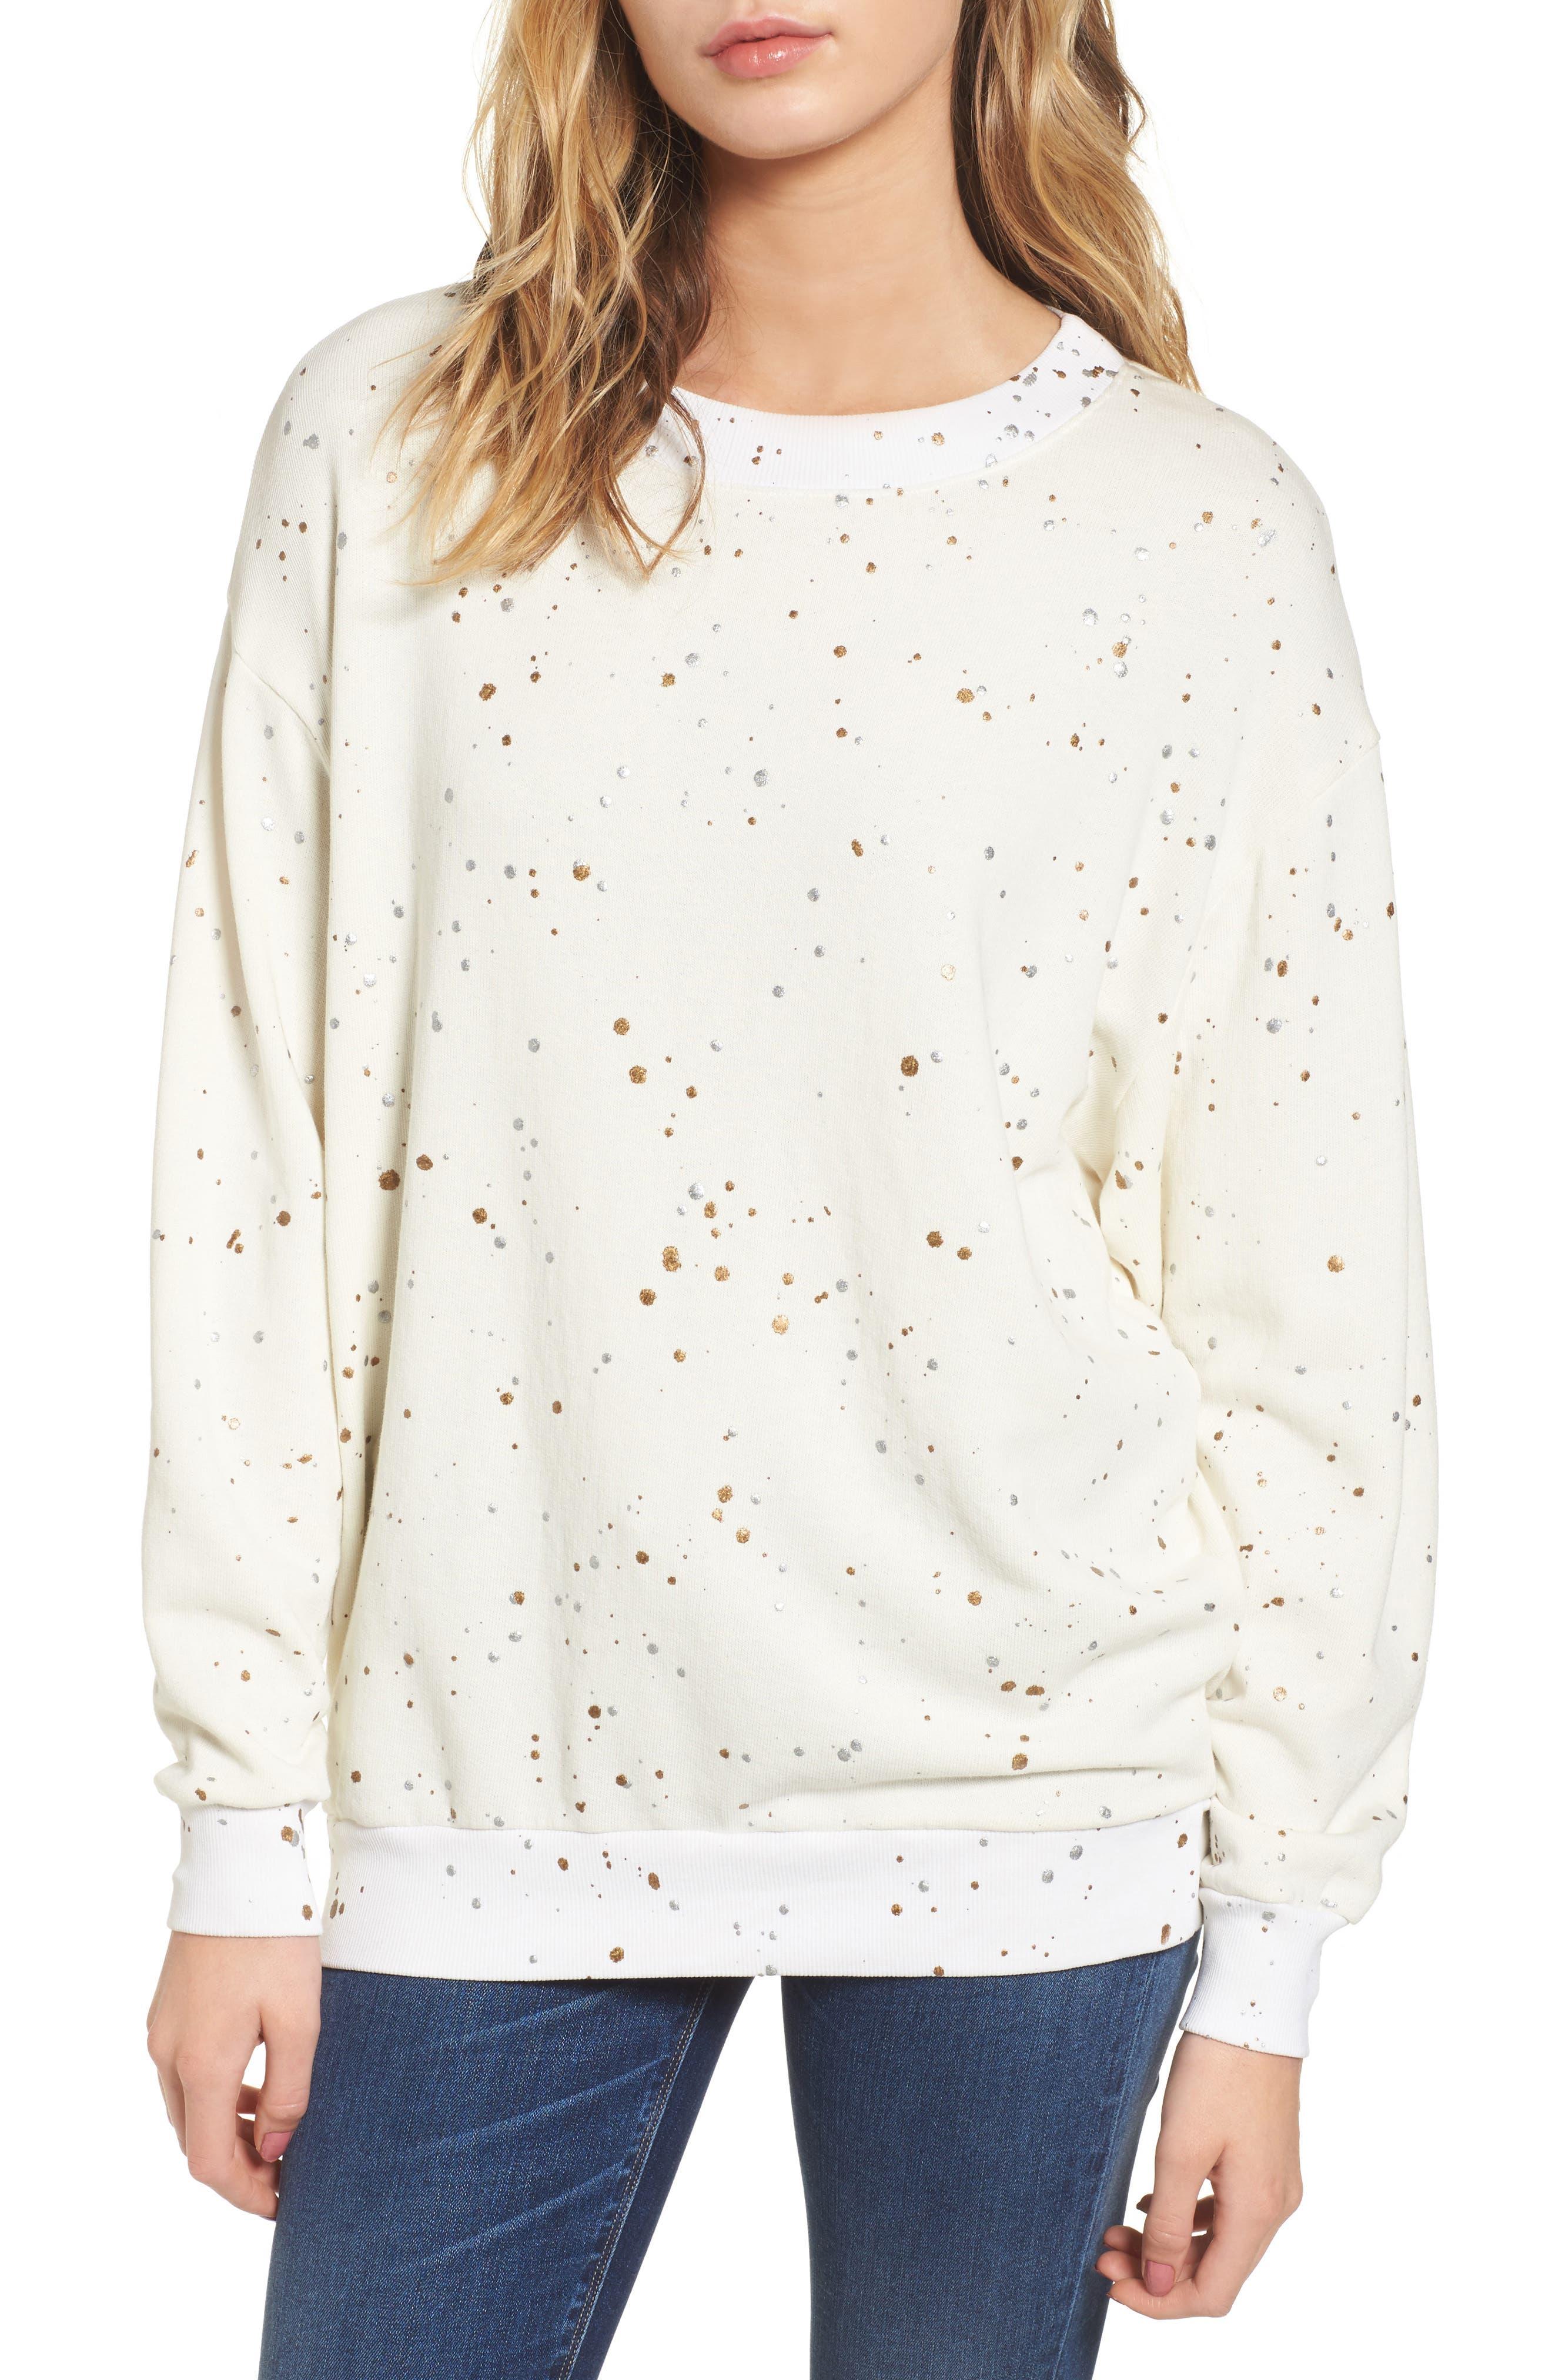 Splendid Graphic Sweatshirt